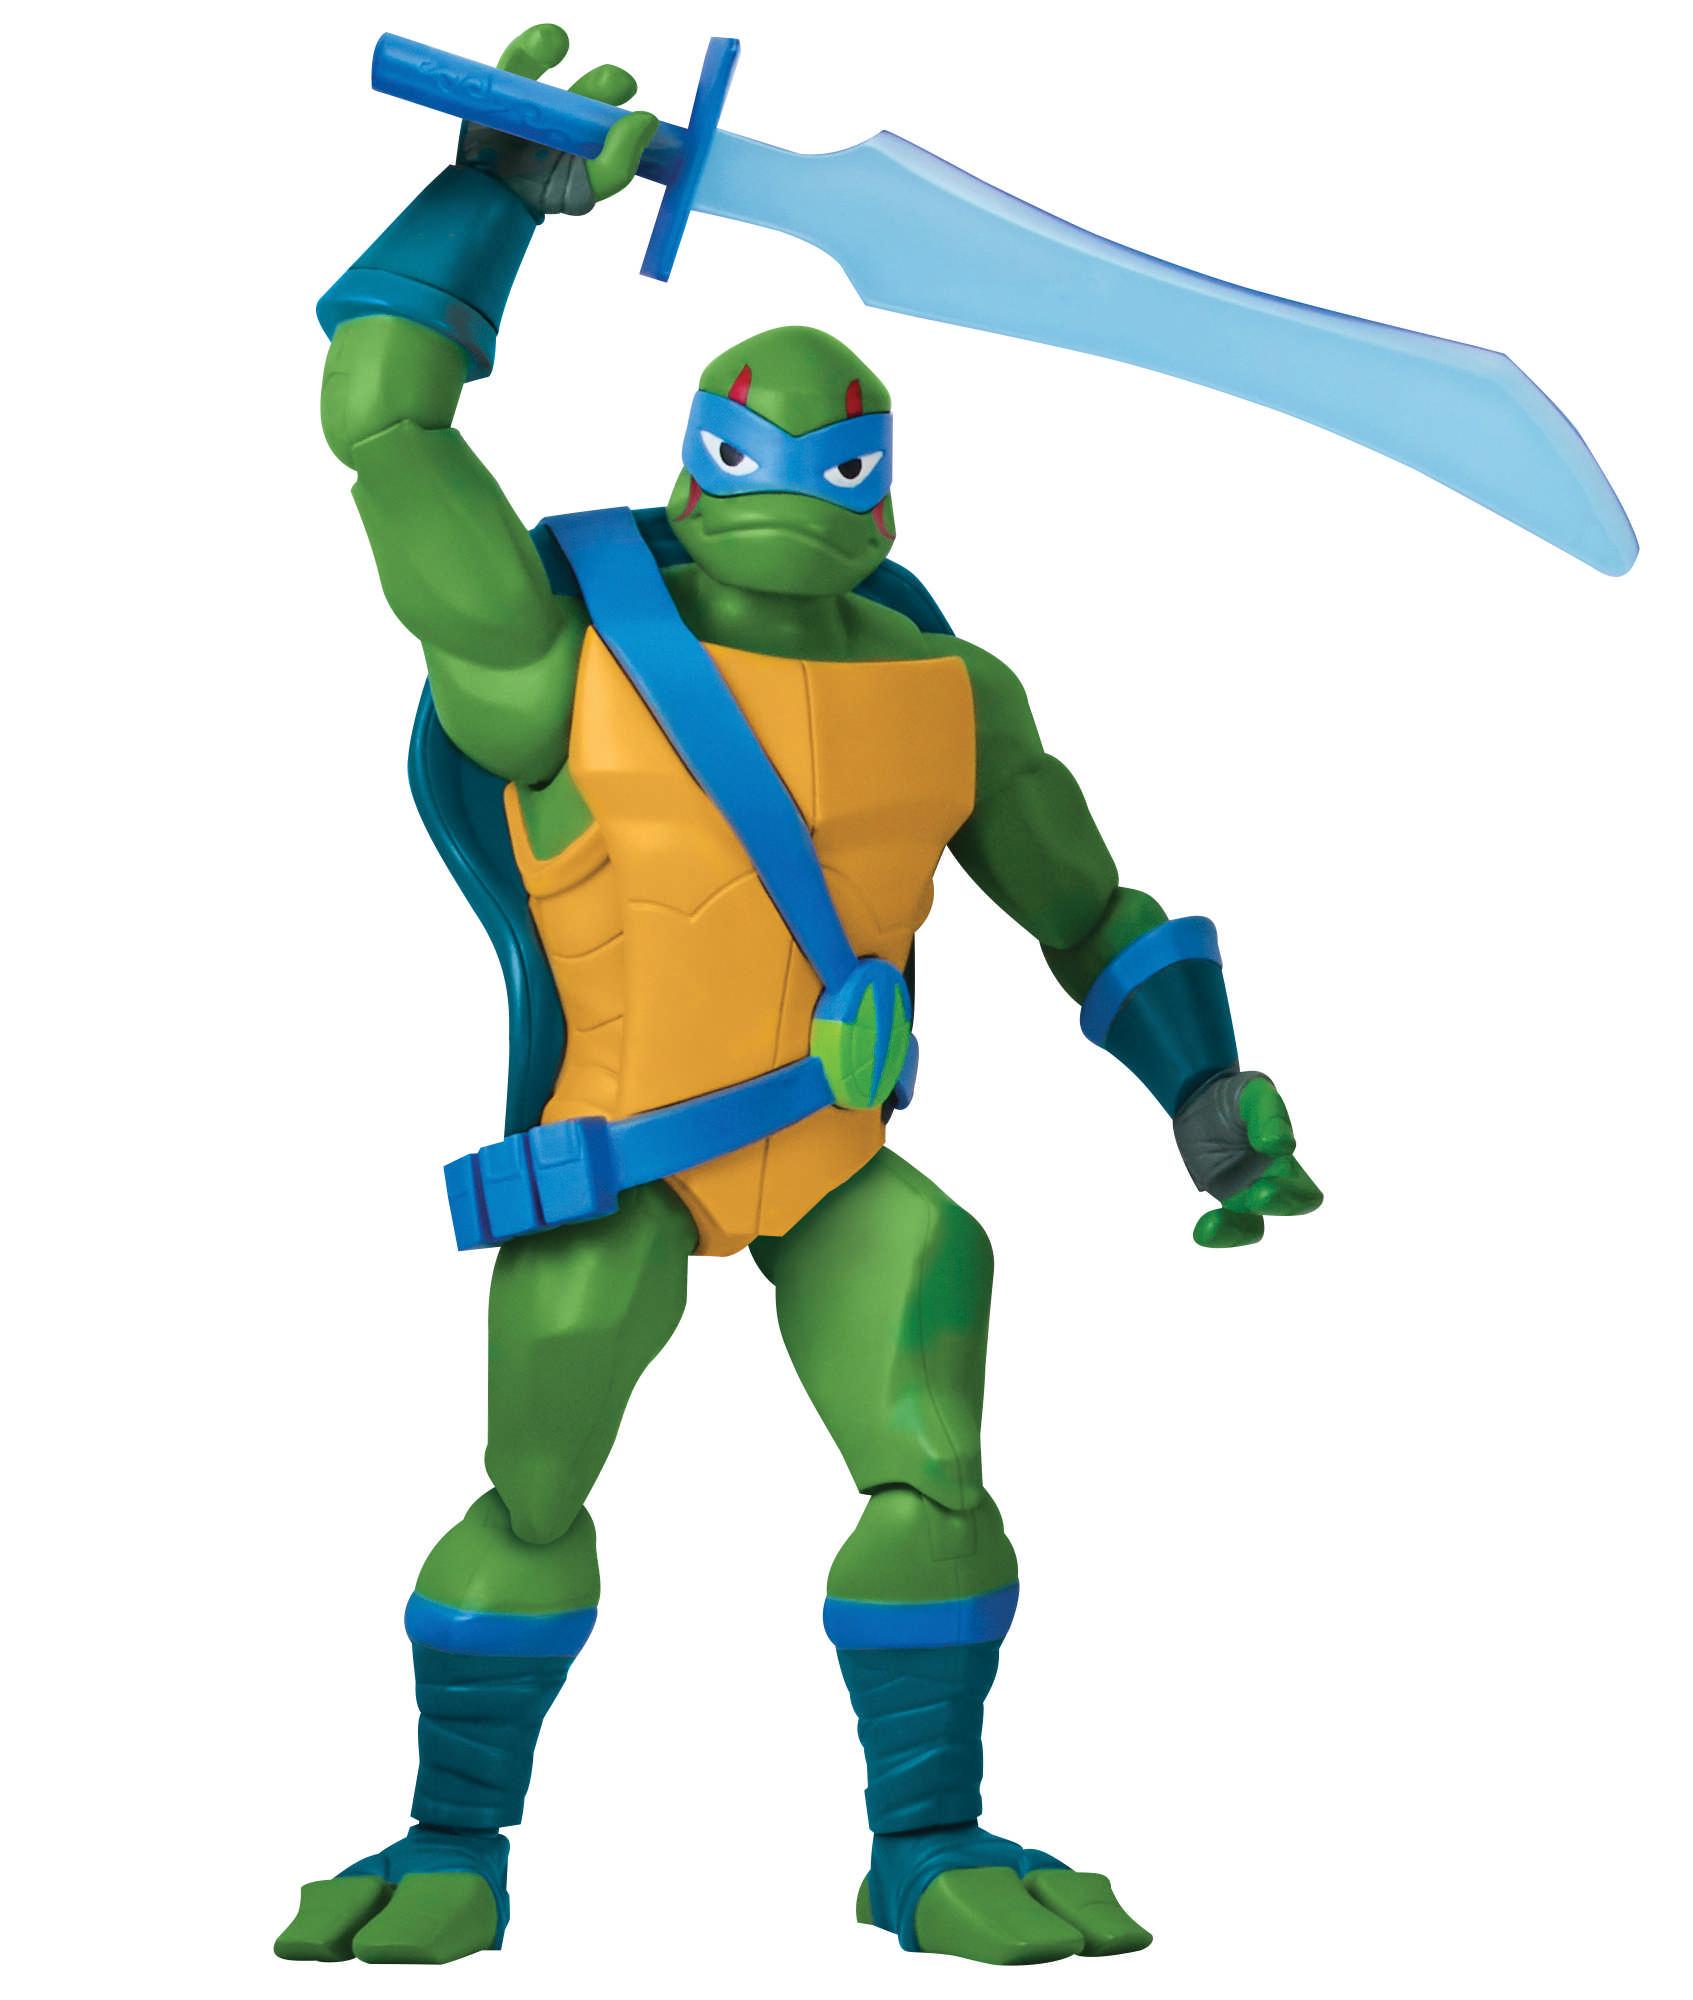 Giant Leonardo (2018 action figure)